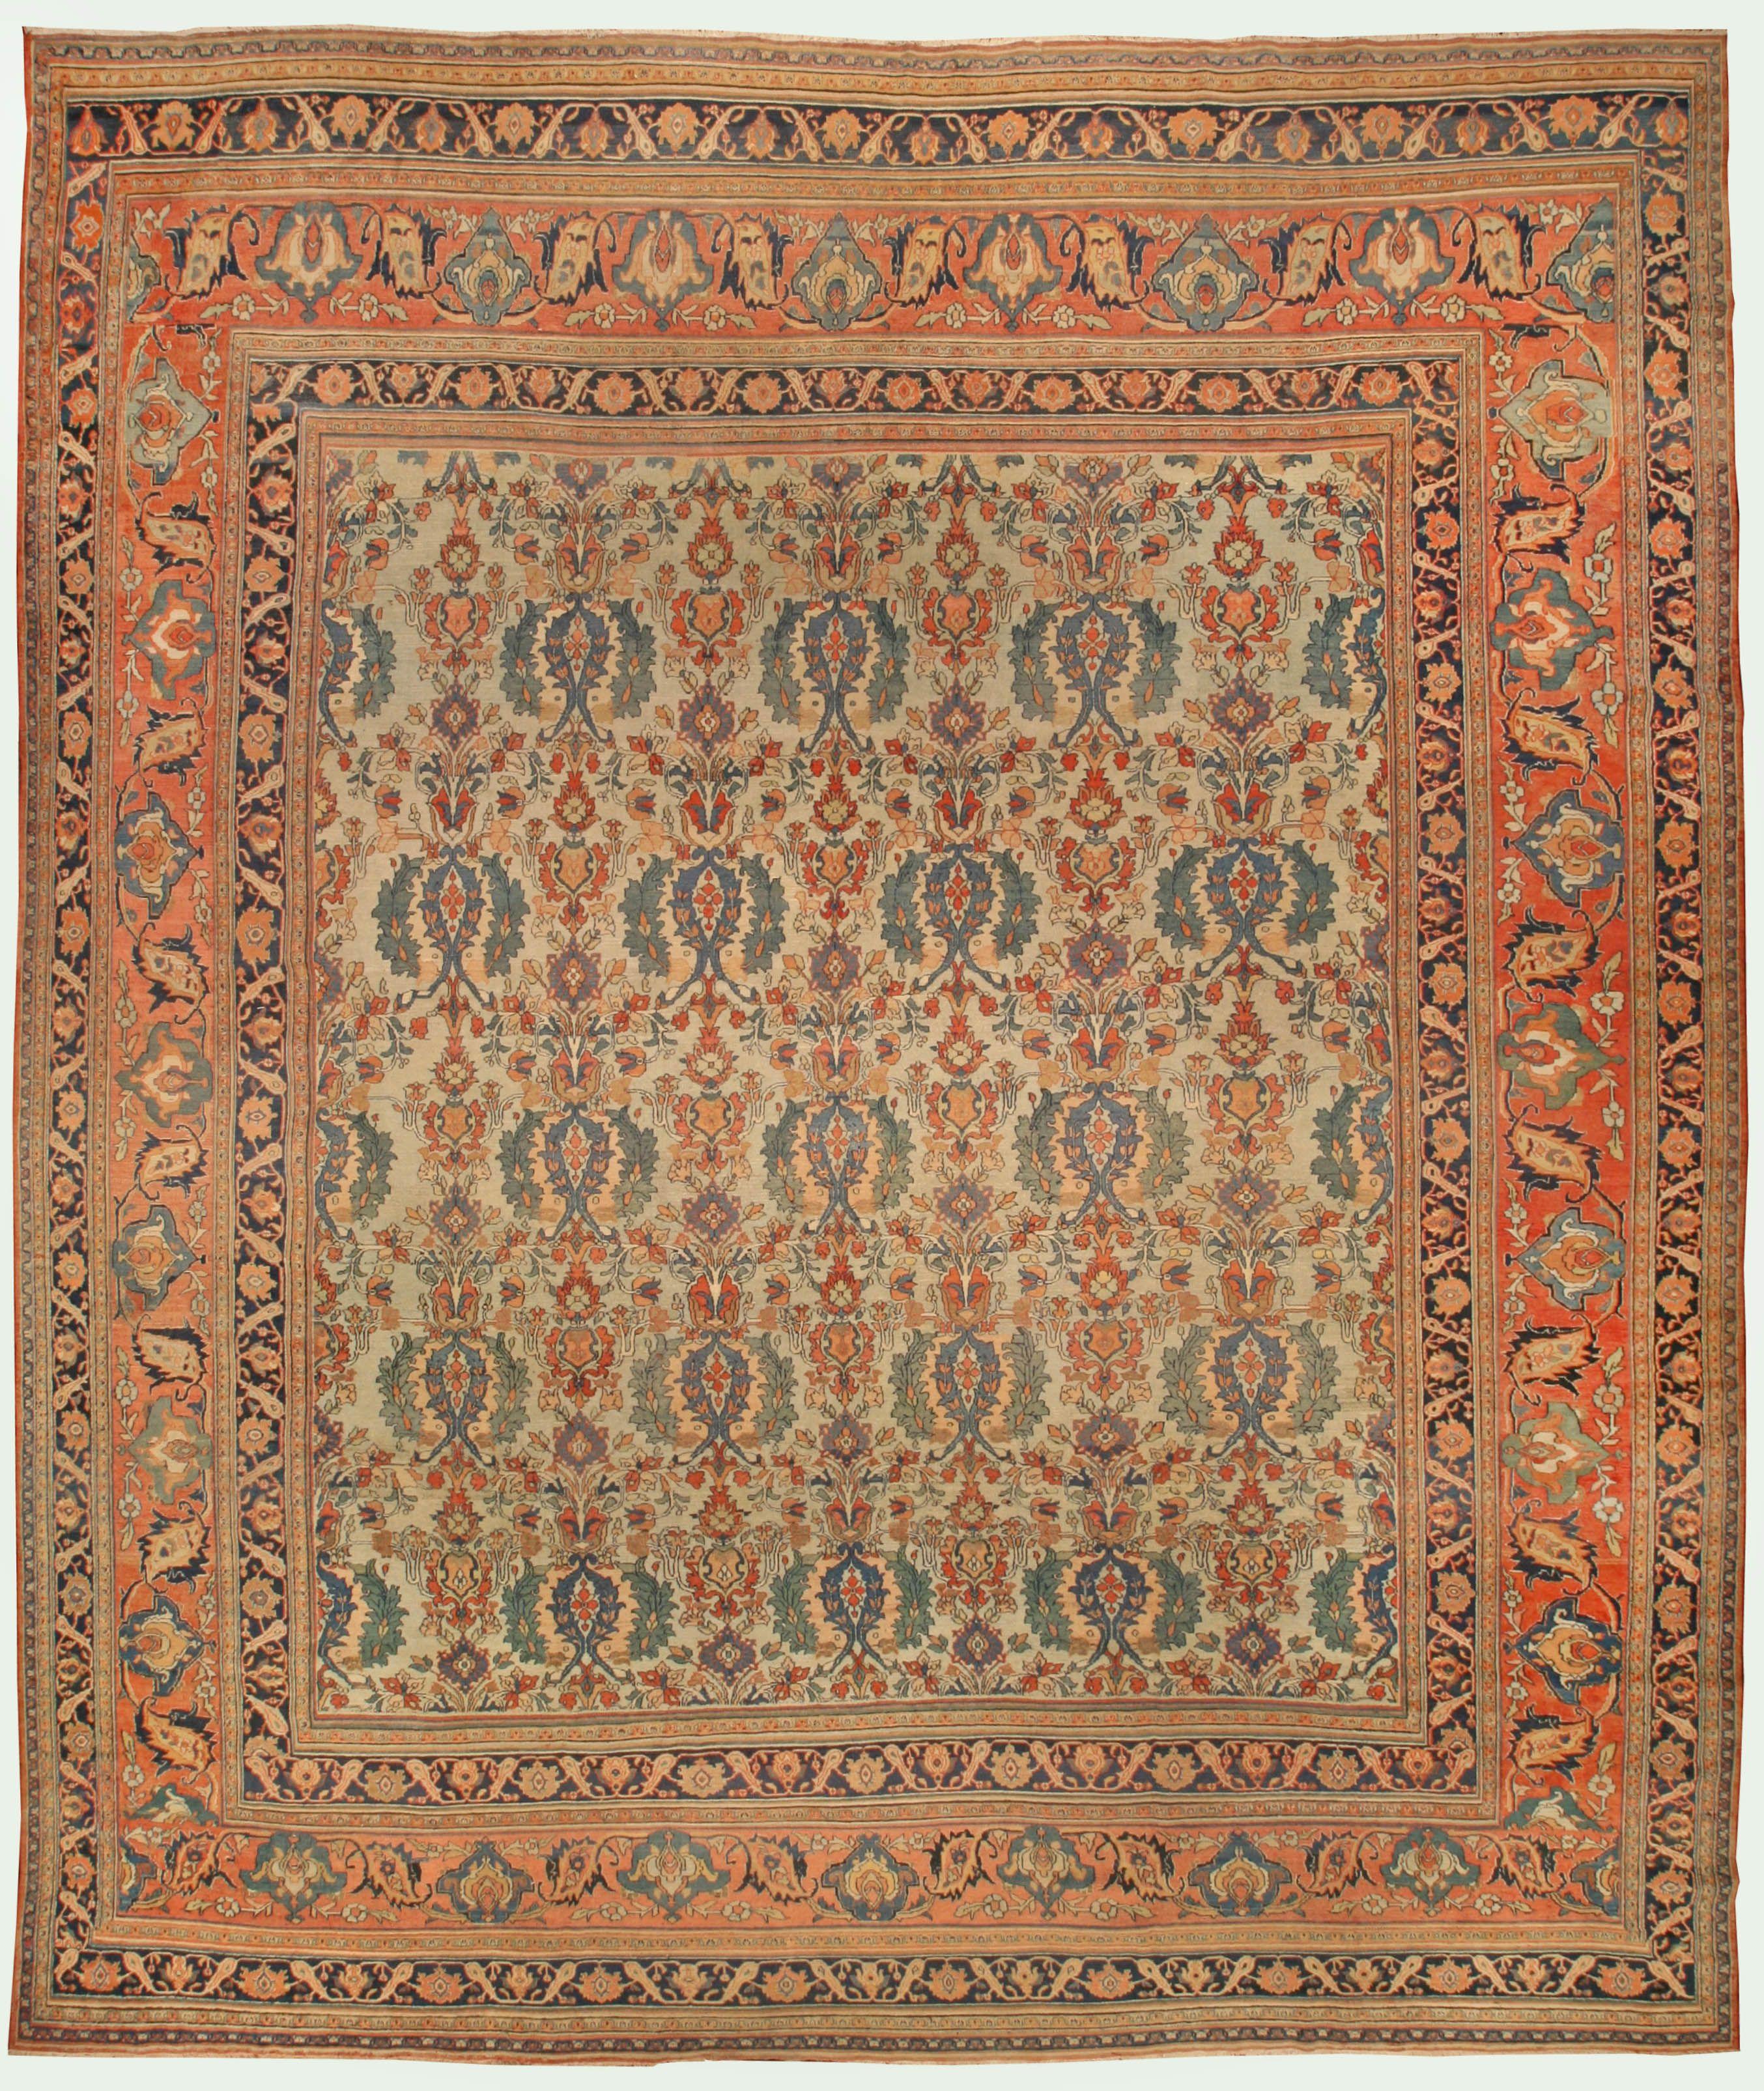 Large Antique Persian Khoran Rug In